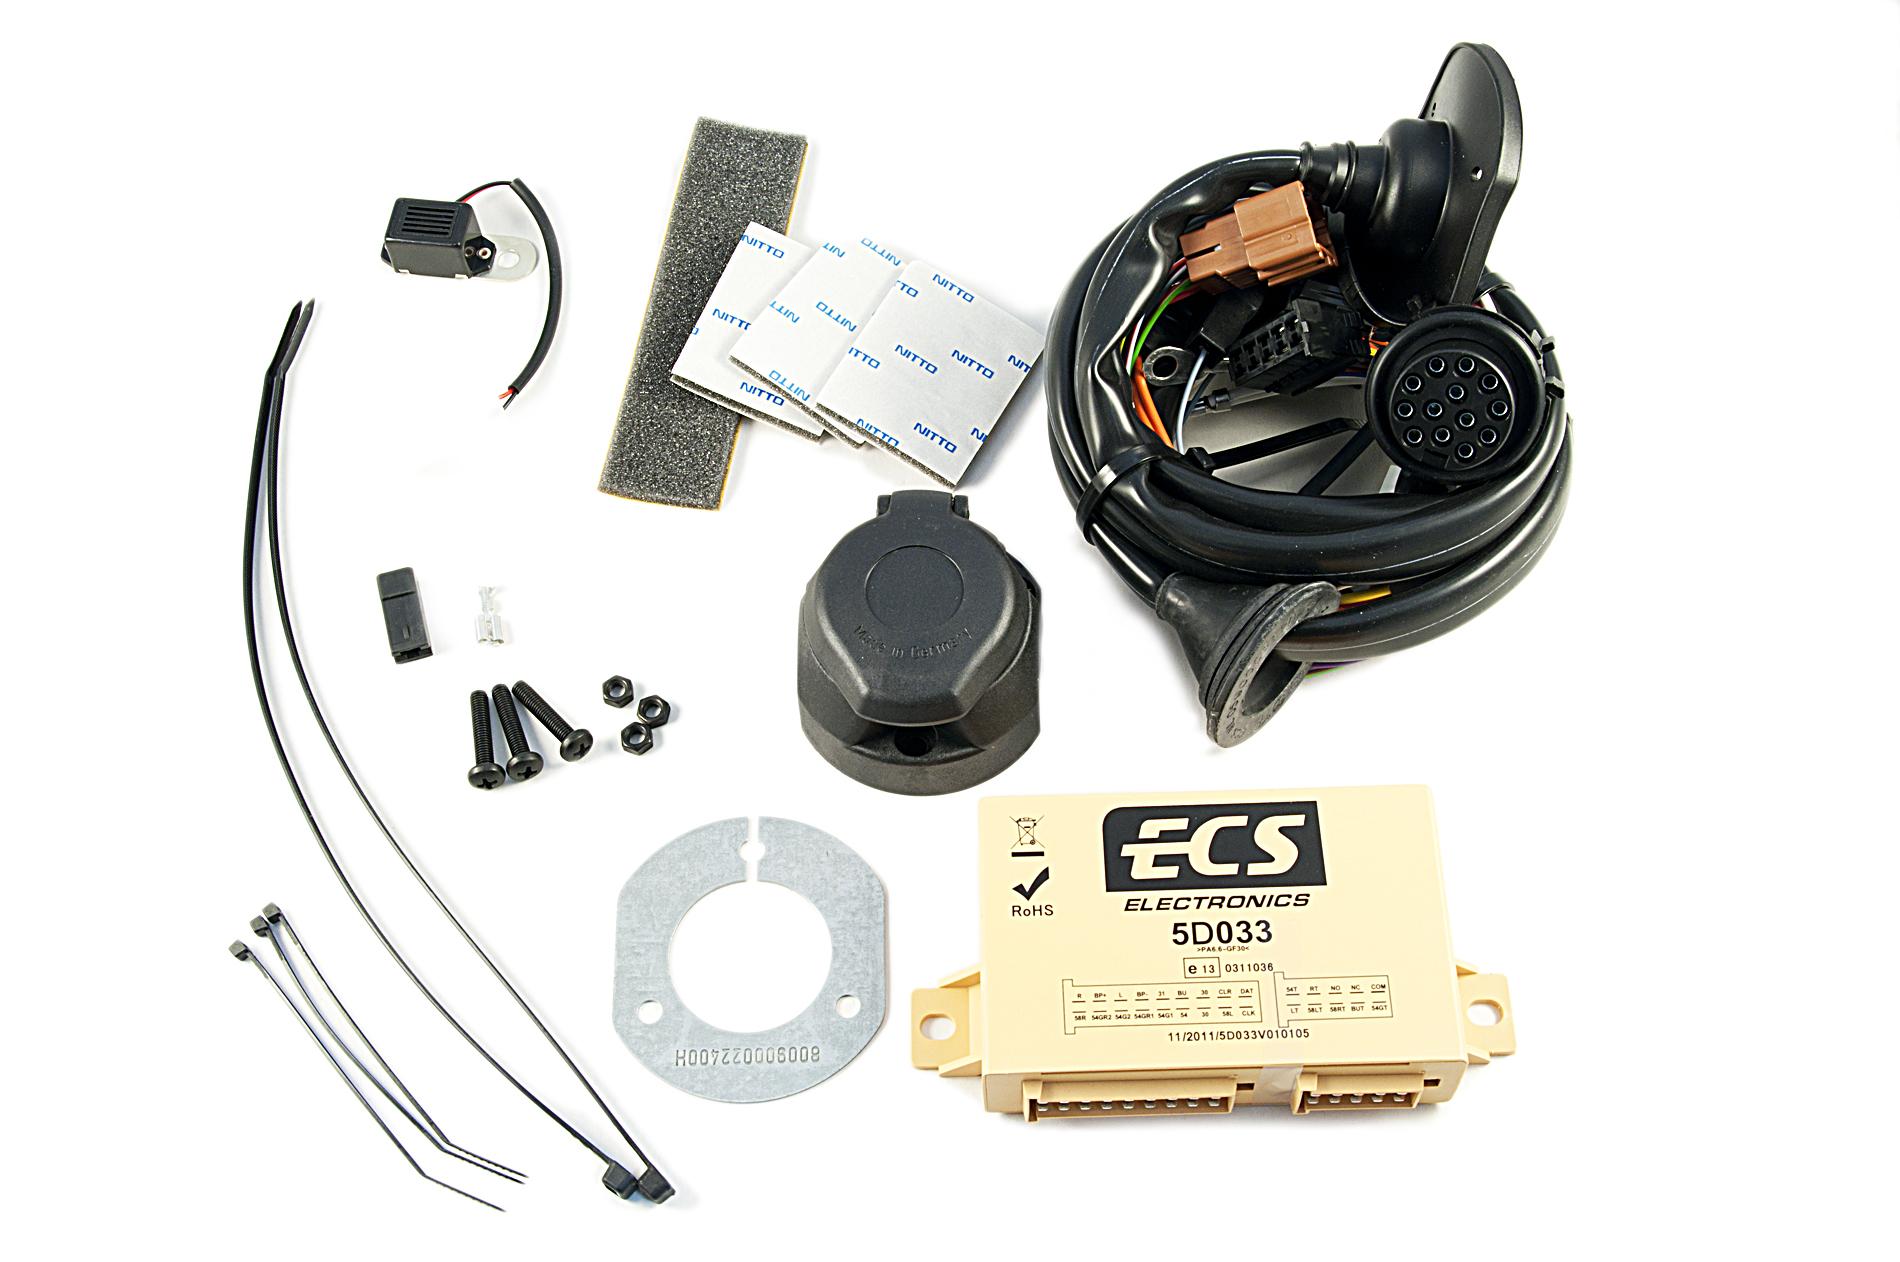 hight resolution of nissan genuine 13 pin electrical kit wiring for towbar hitch ke505jg213 ebay